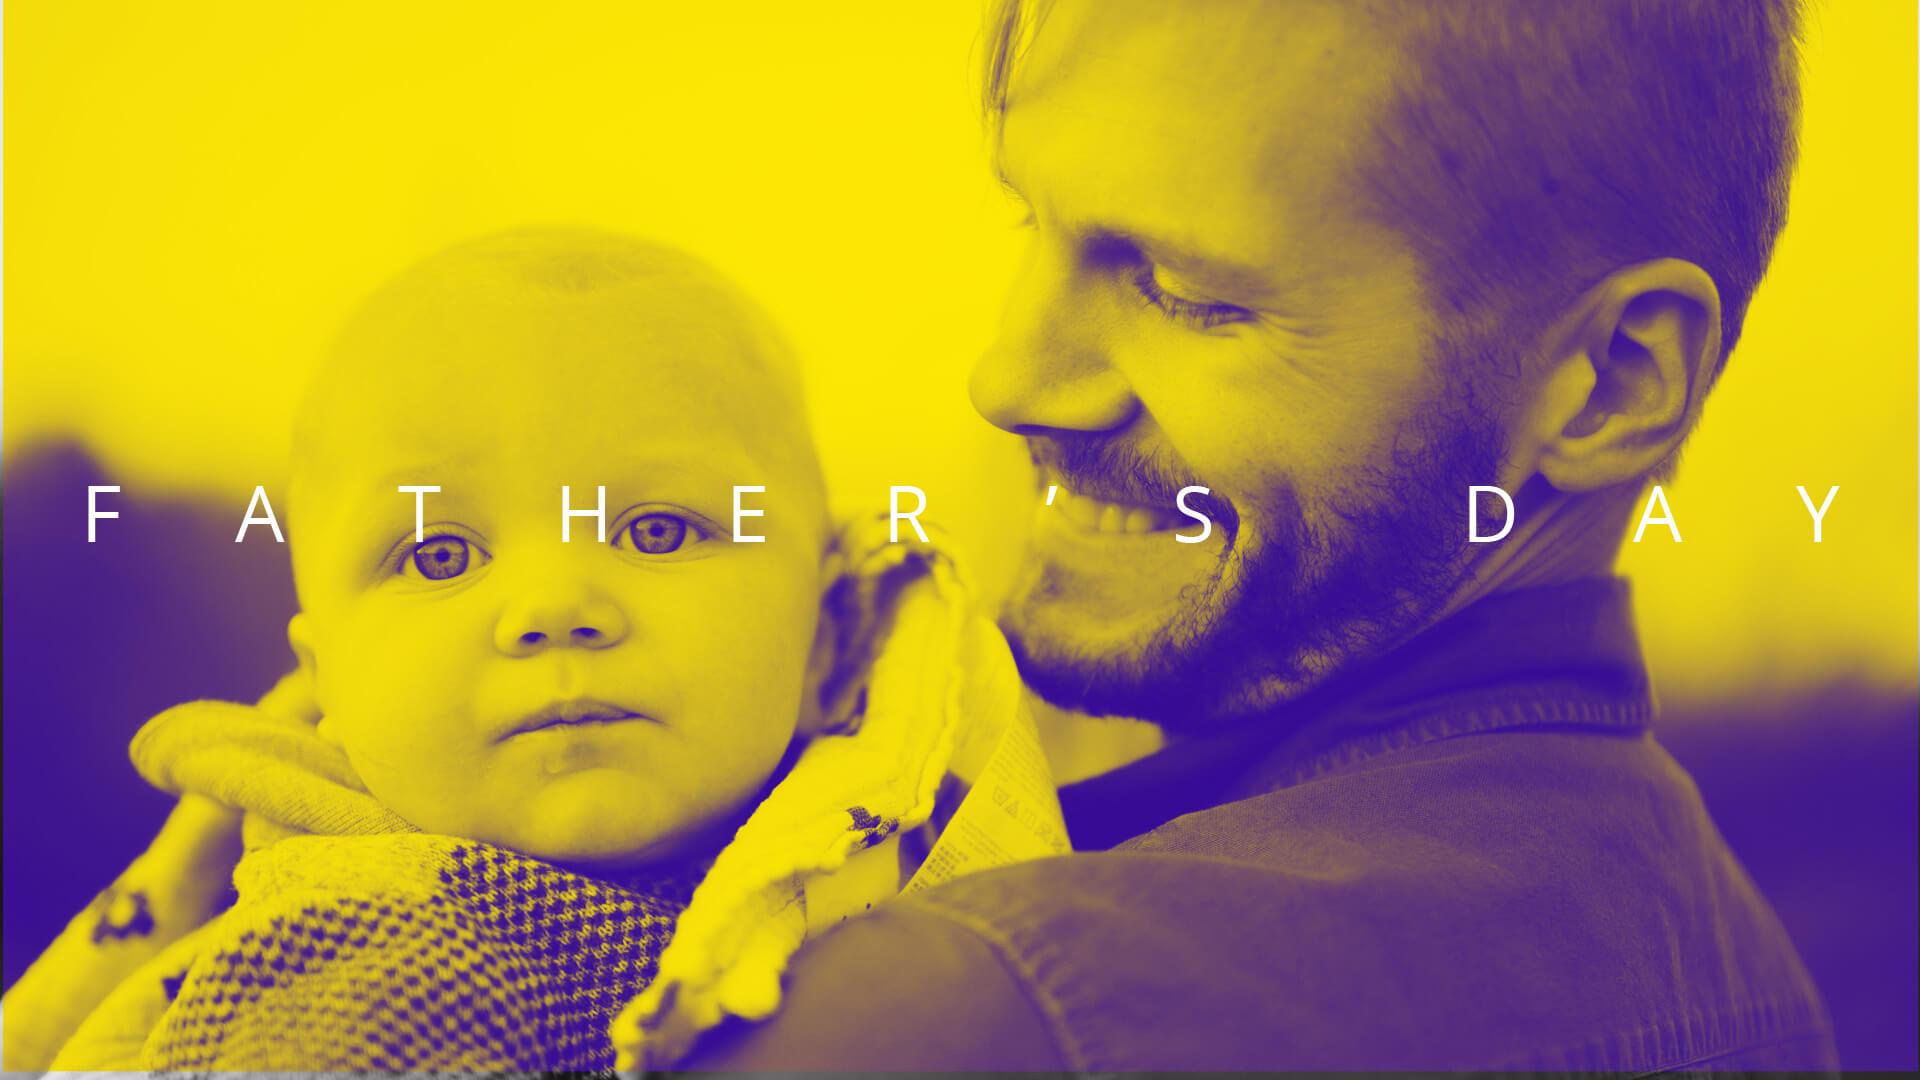 Sermon - Fathers Day - 1920x1080.jpg